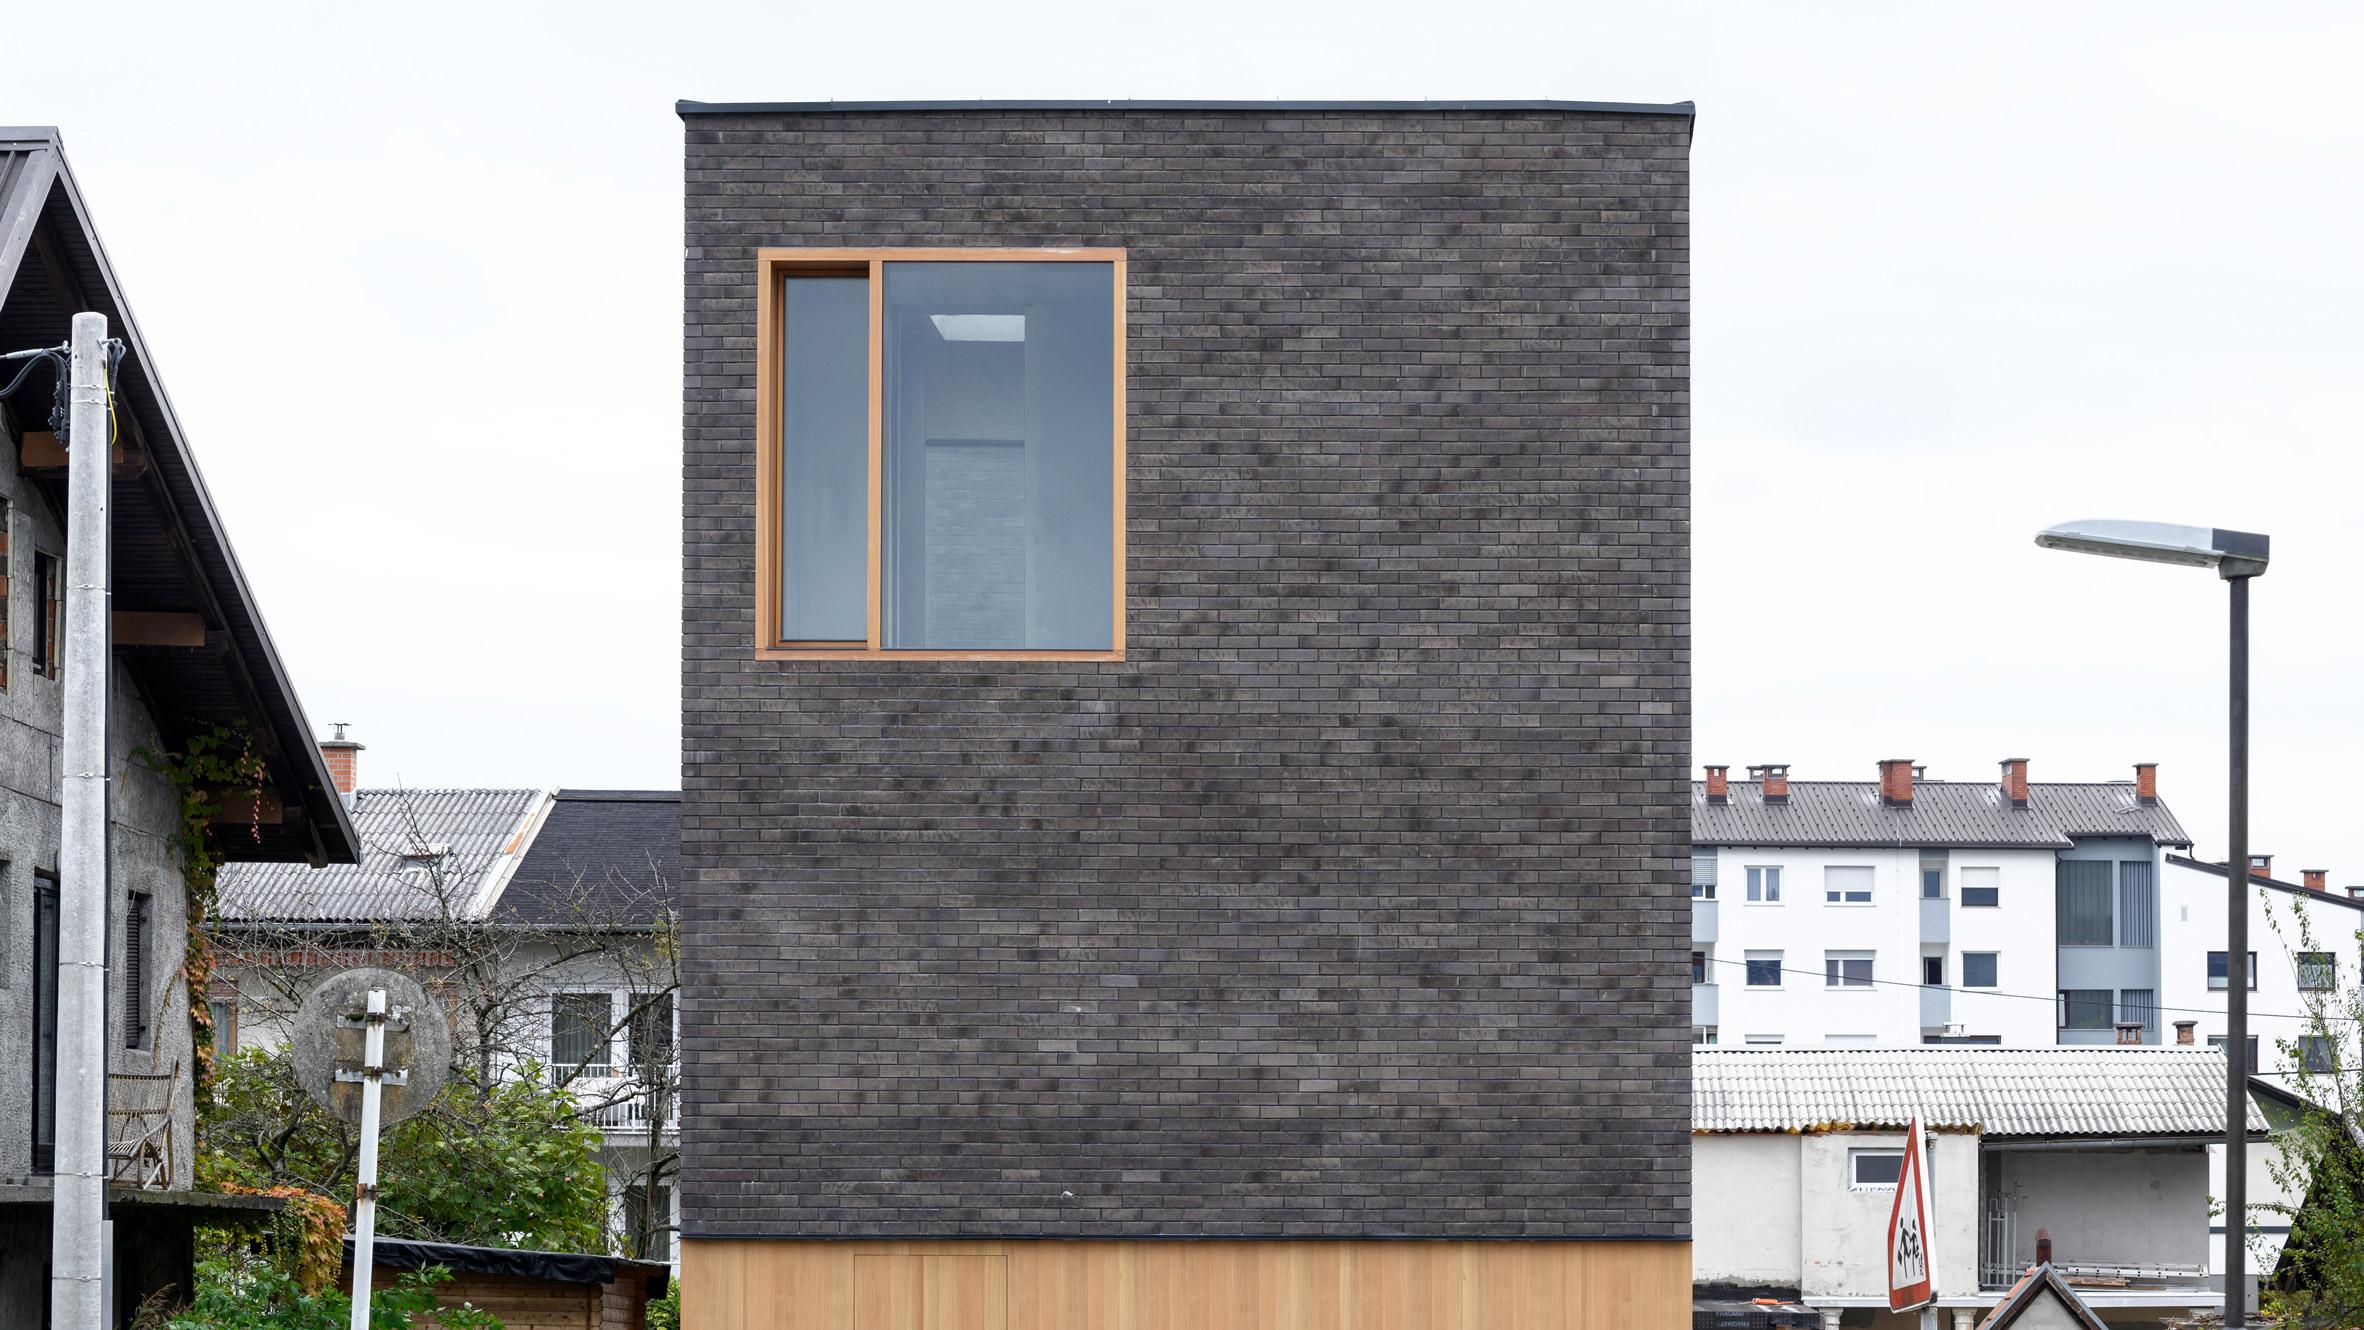 Brick facade of The Double Brick House by Arhitektura